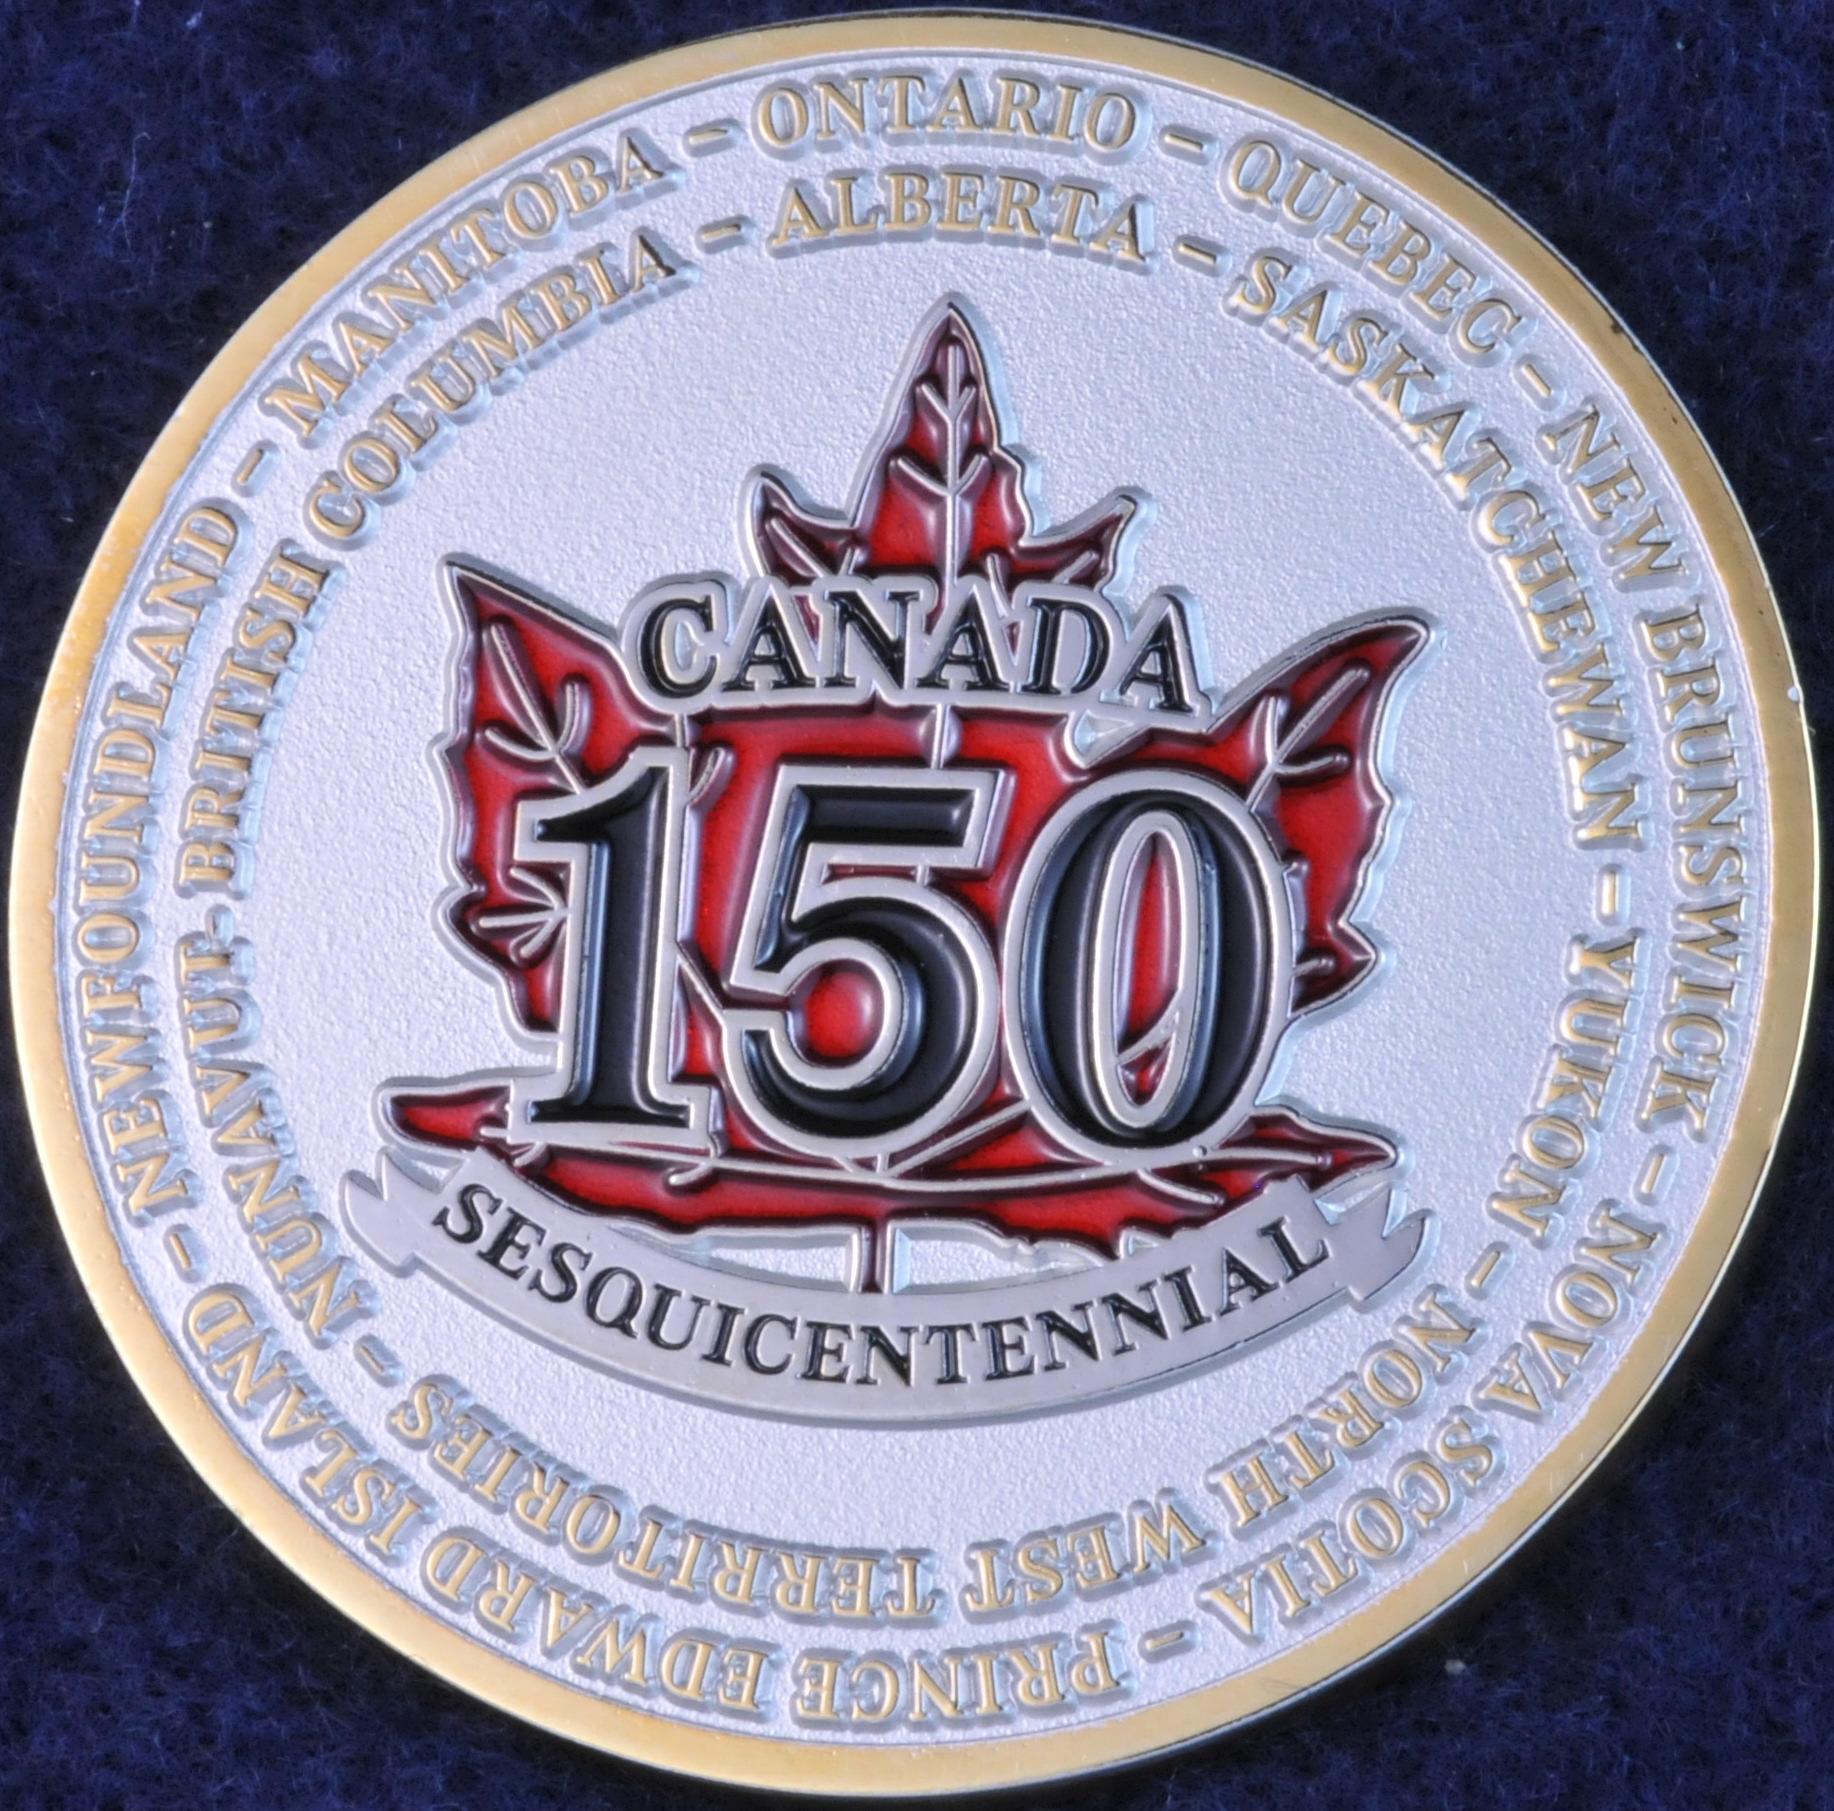 international police association canada 150